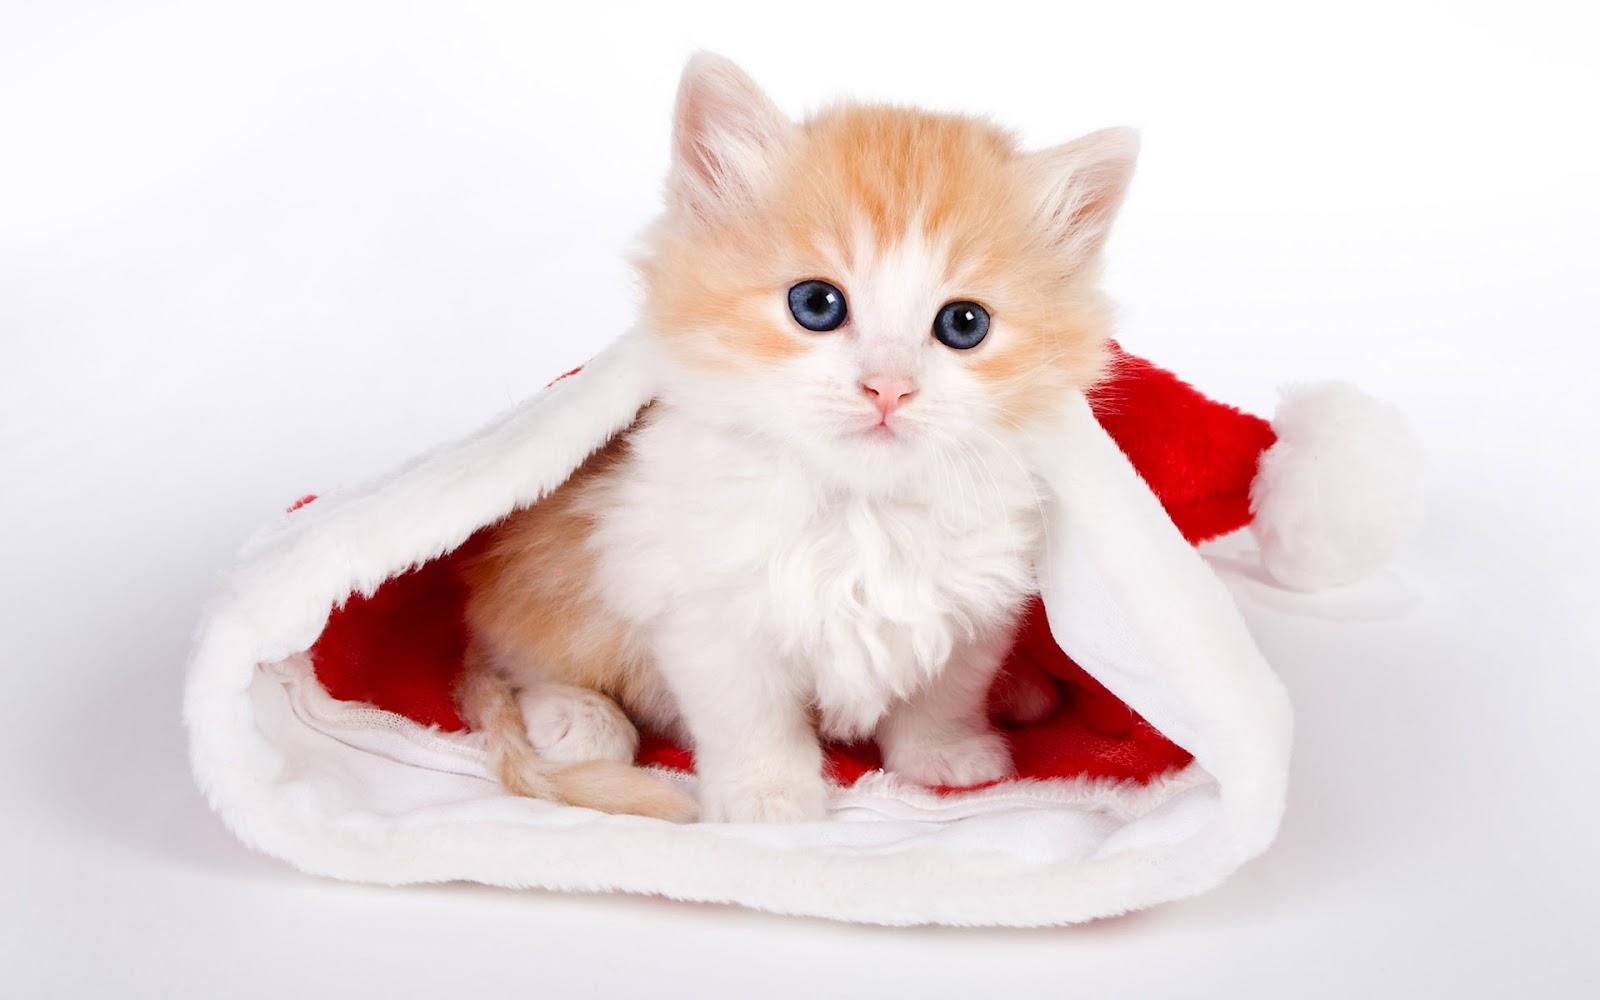 wallpaper kucing lucu dan imut foto kucing imut kucing lucu wallpaper